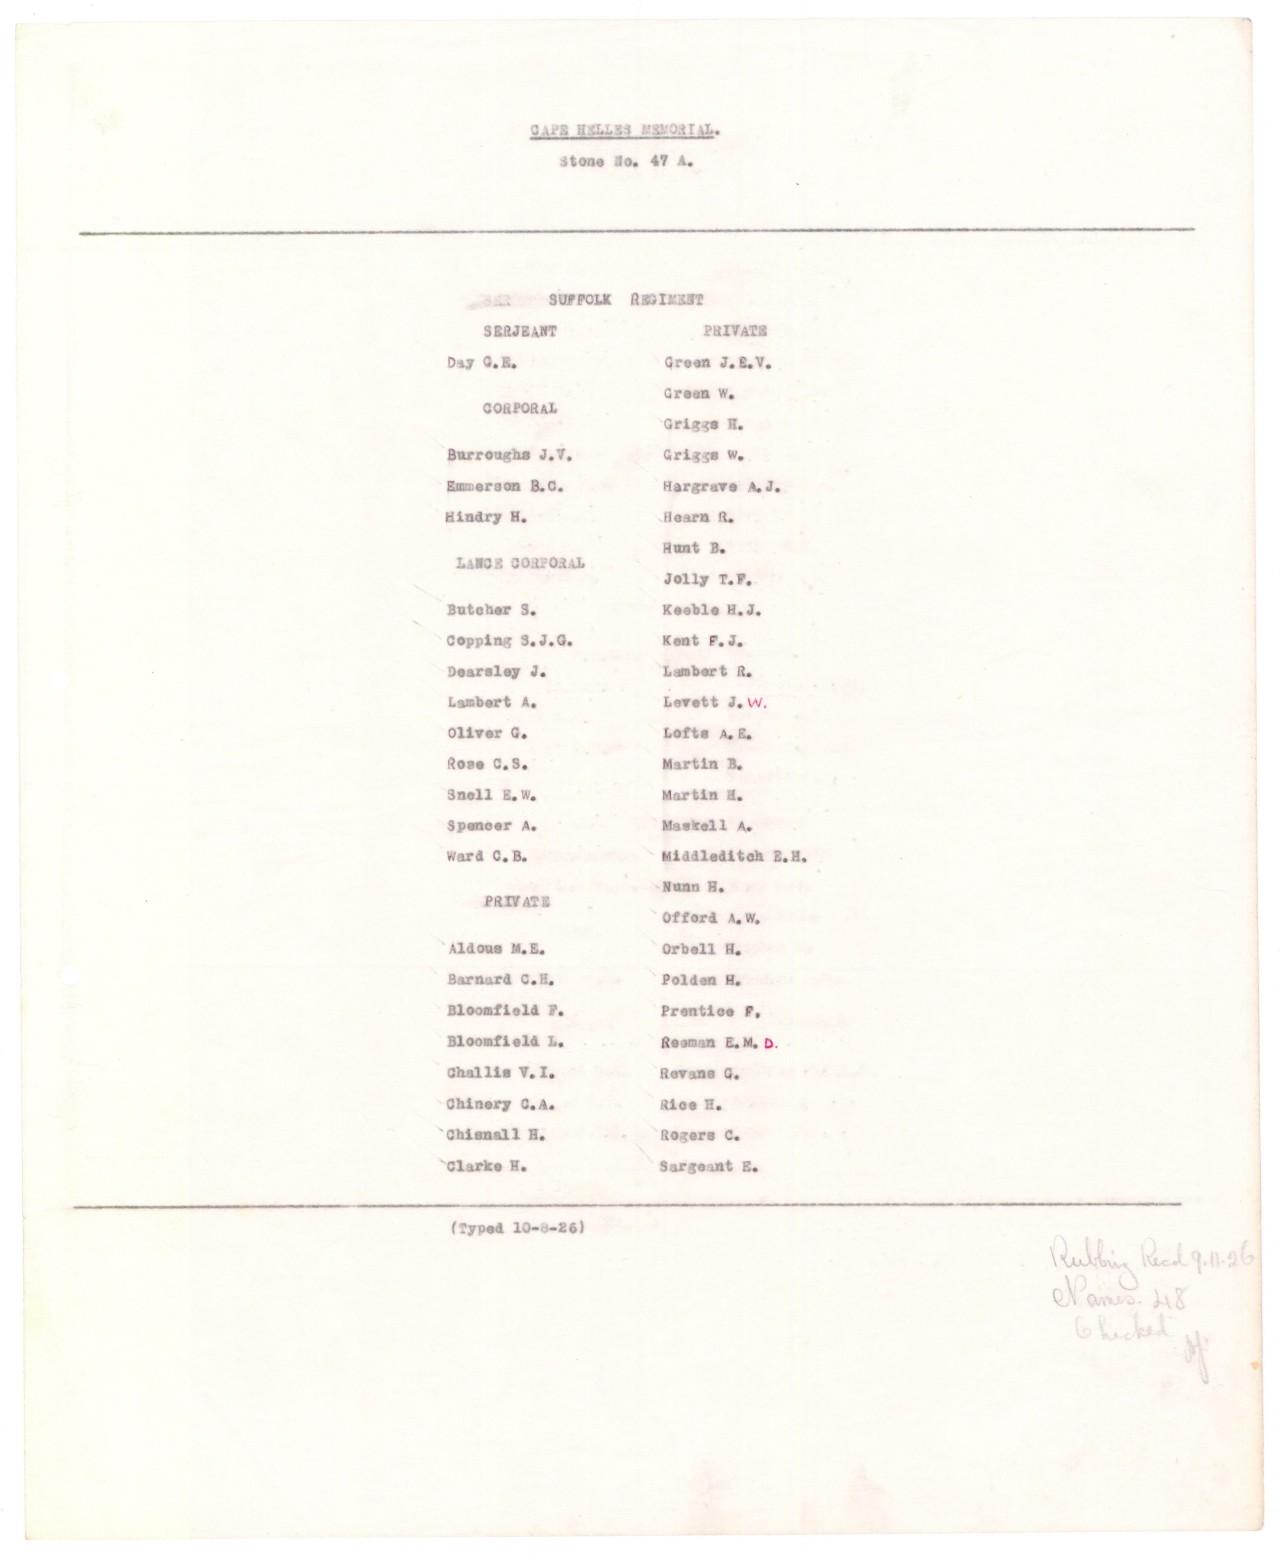 GR Panels list.JPG